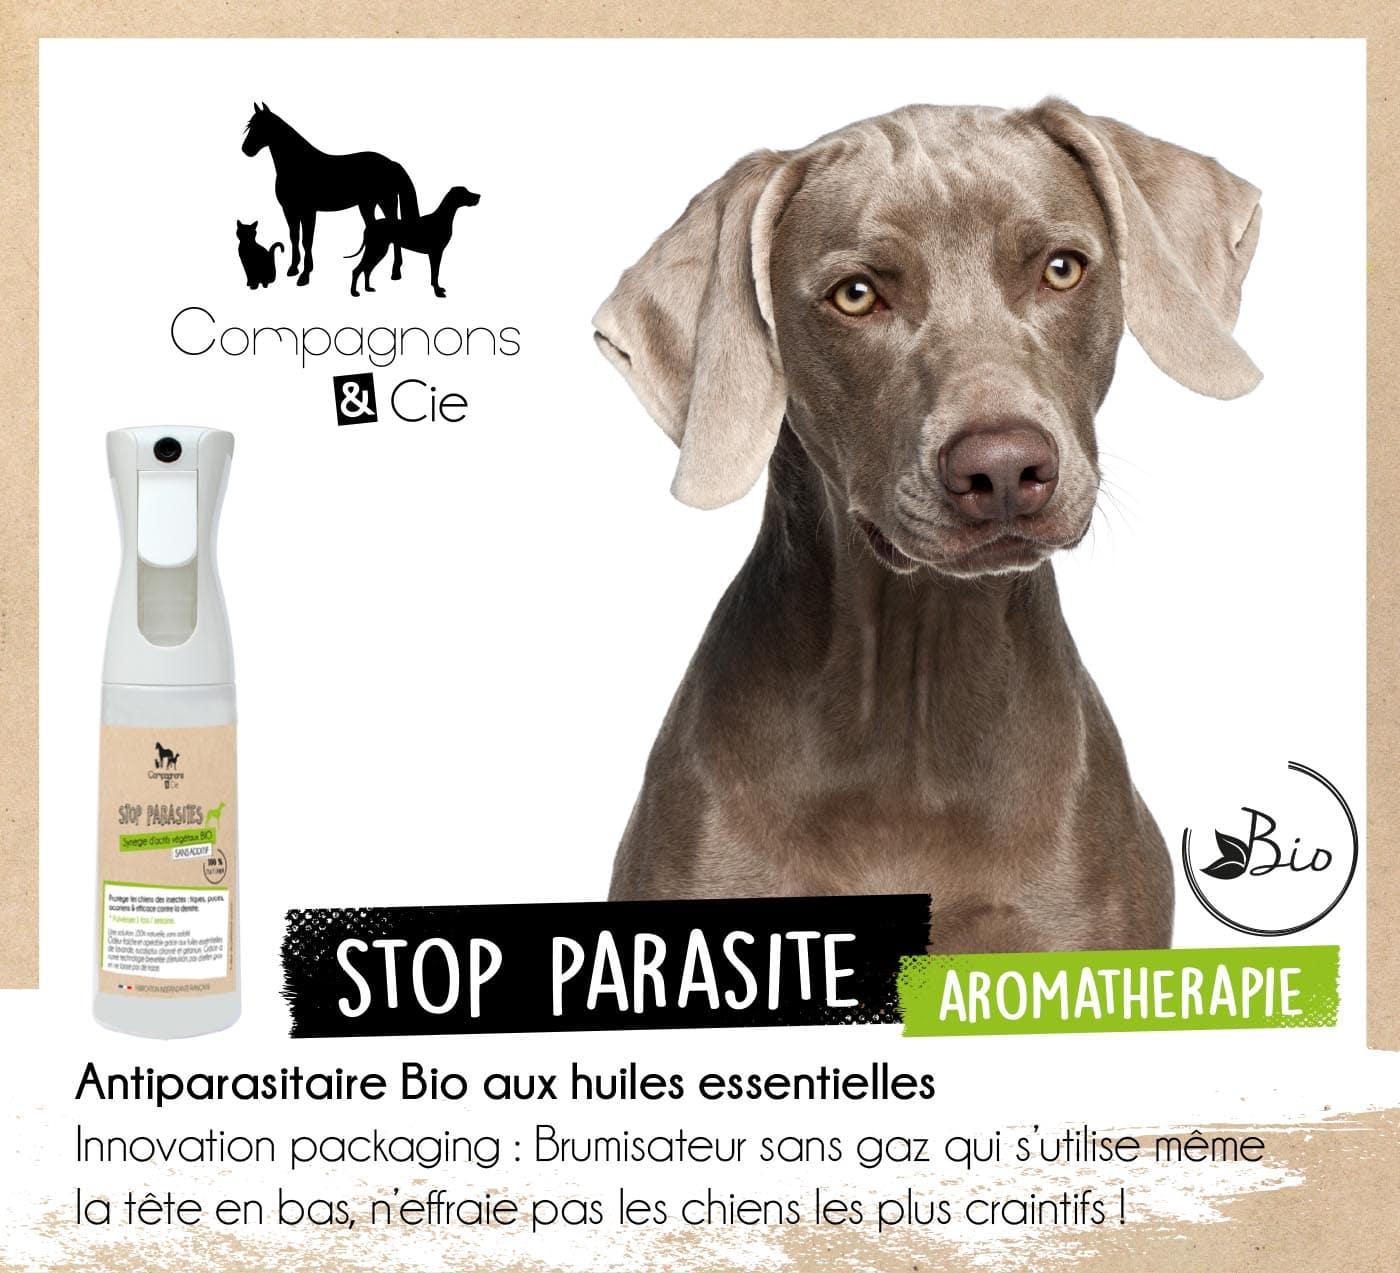 soin chien naturel aromatherapie huiles essentielles bio